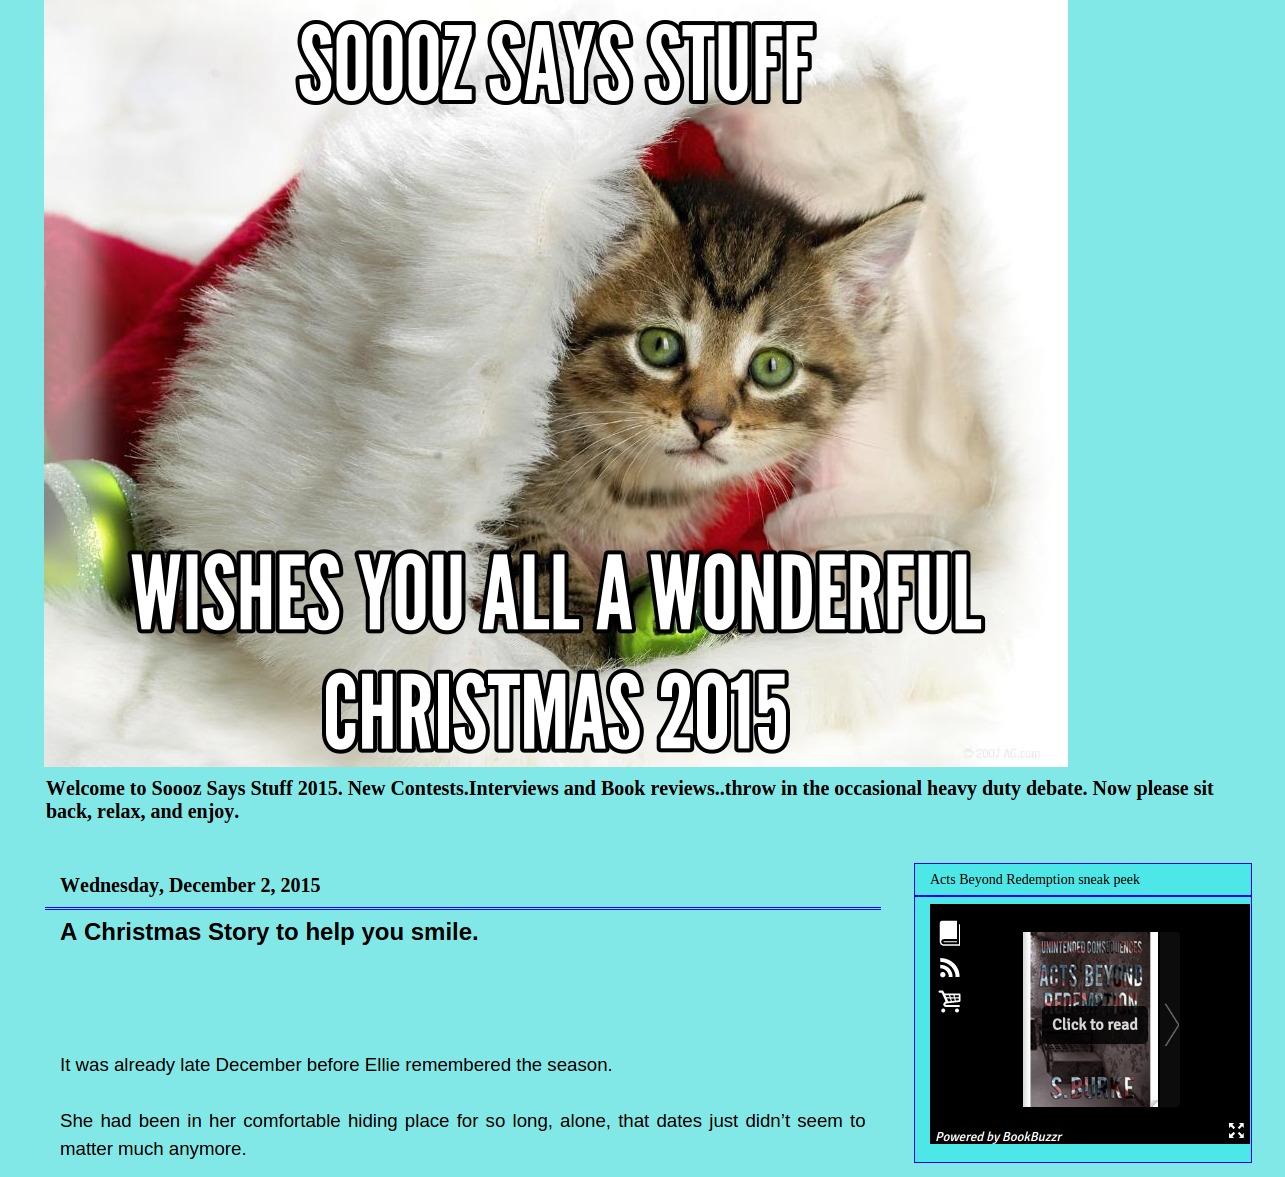 5 BookBuzzr Flipper Installations To Inspire You In December 2015